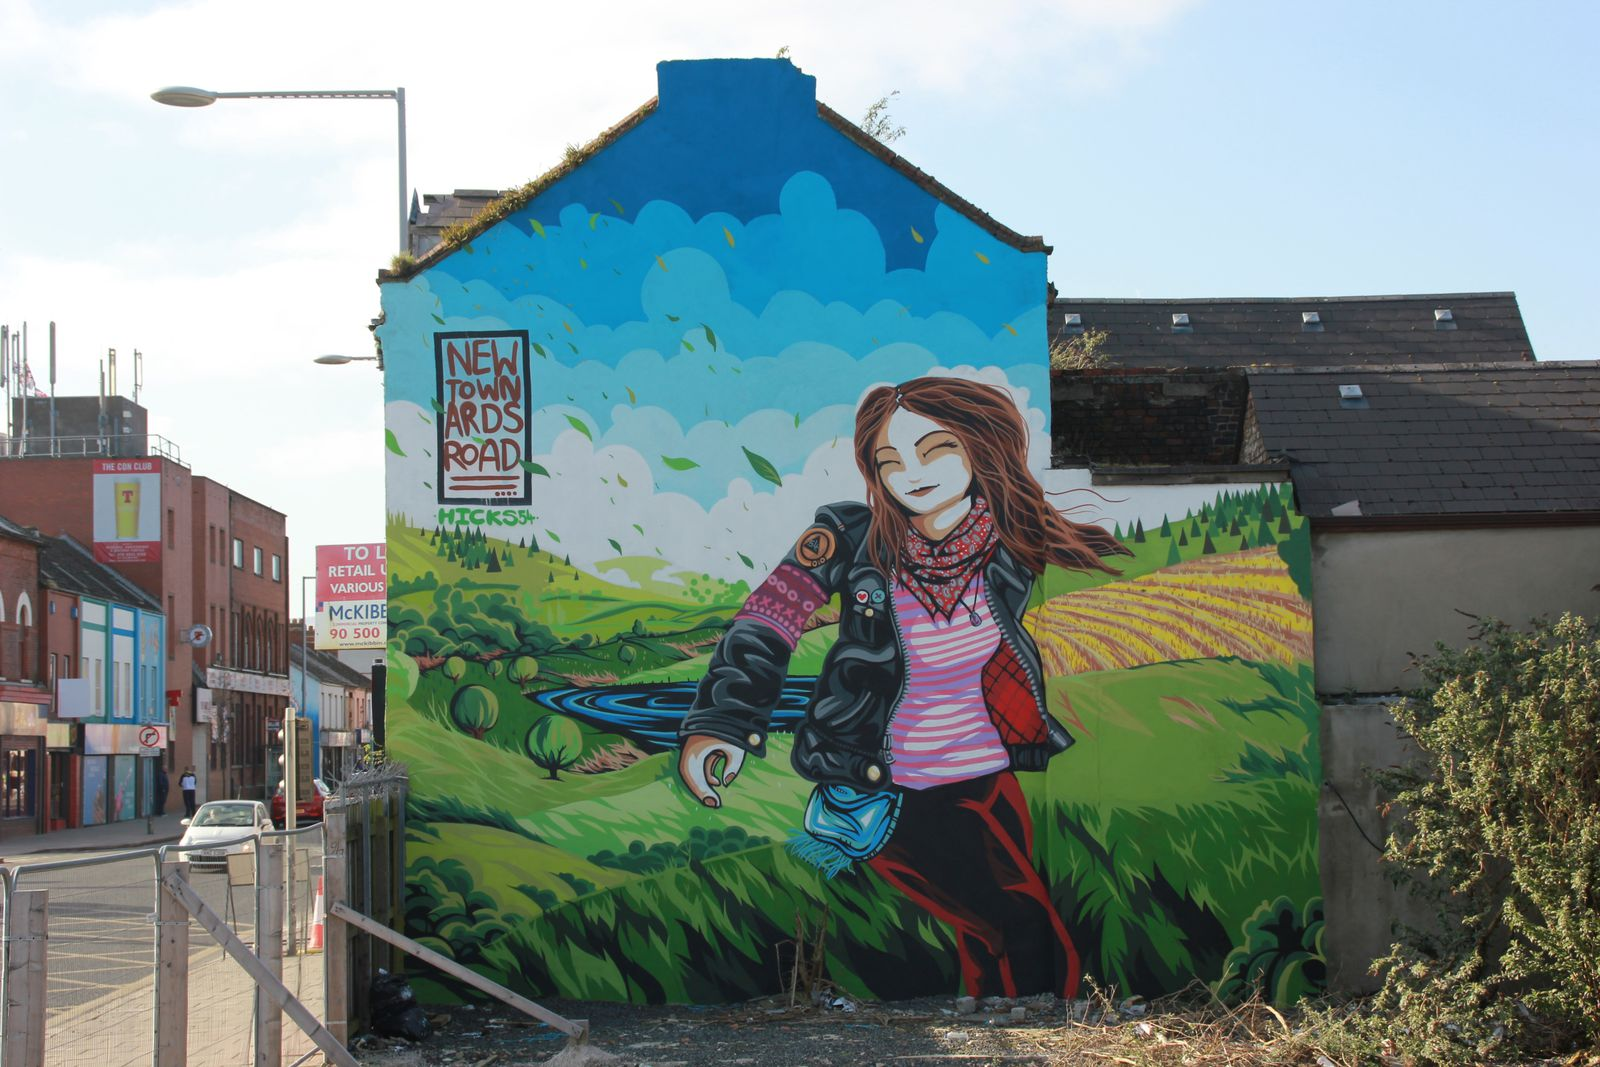 434) Newtownards Road, East Belfast